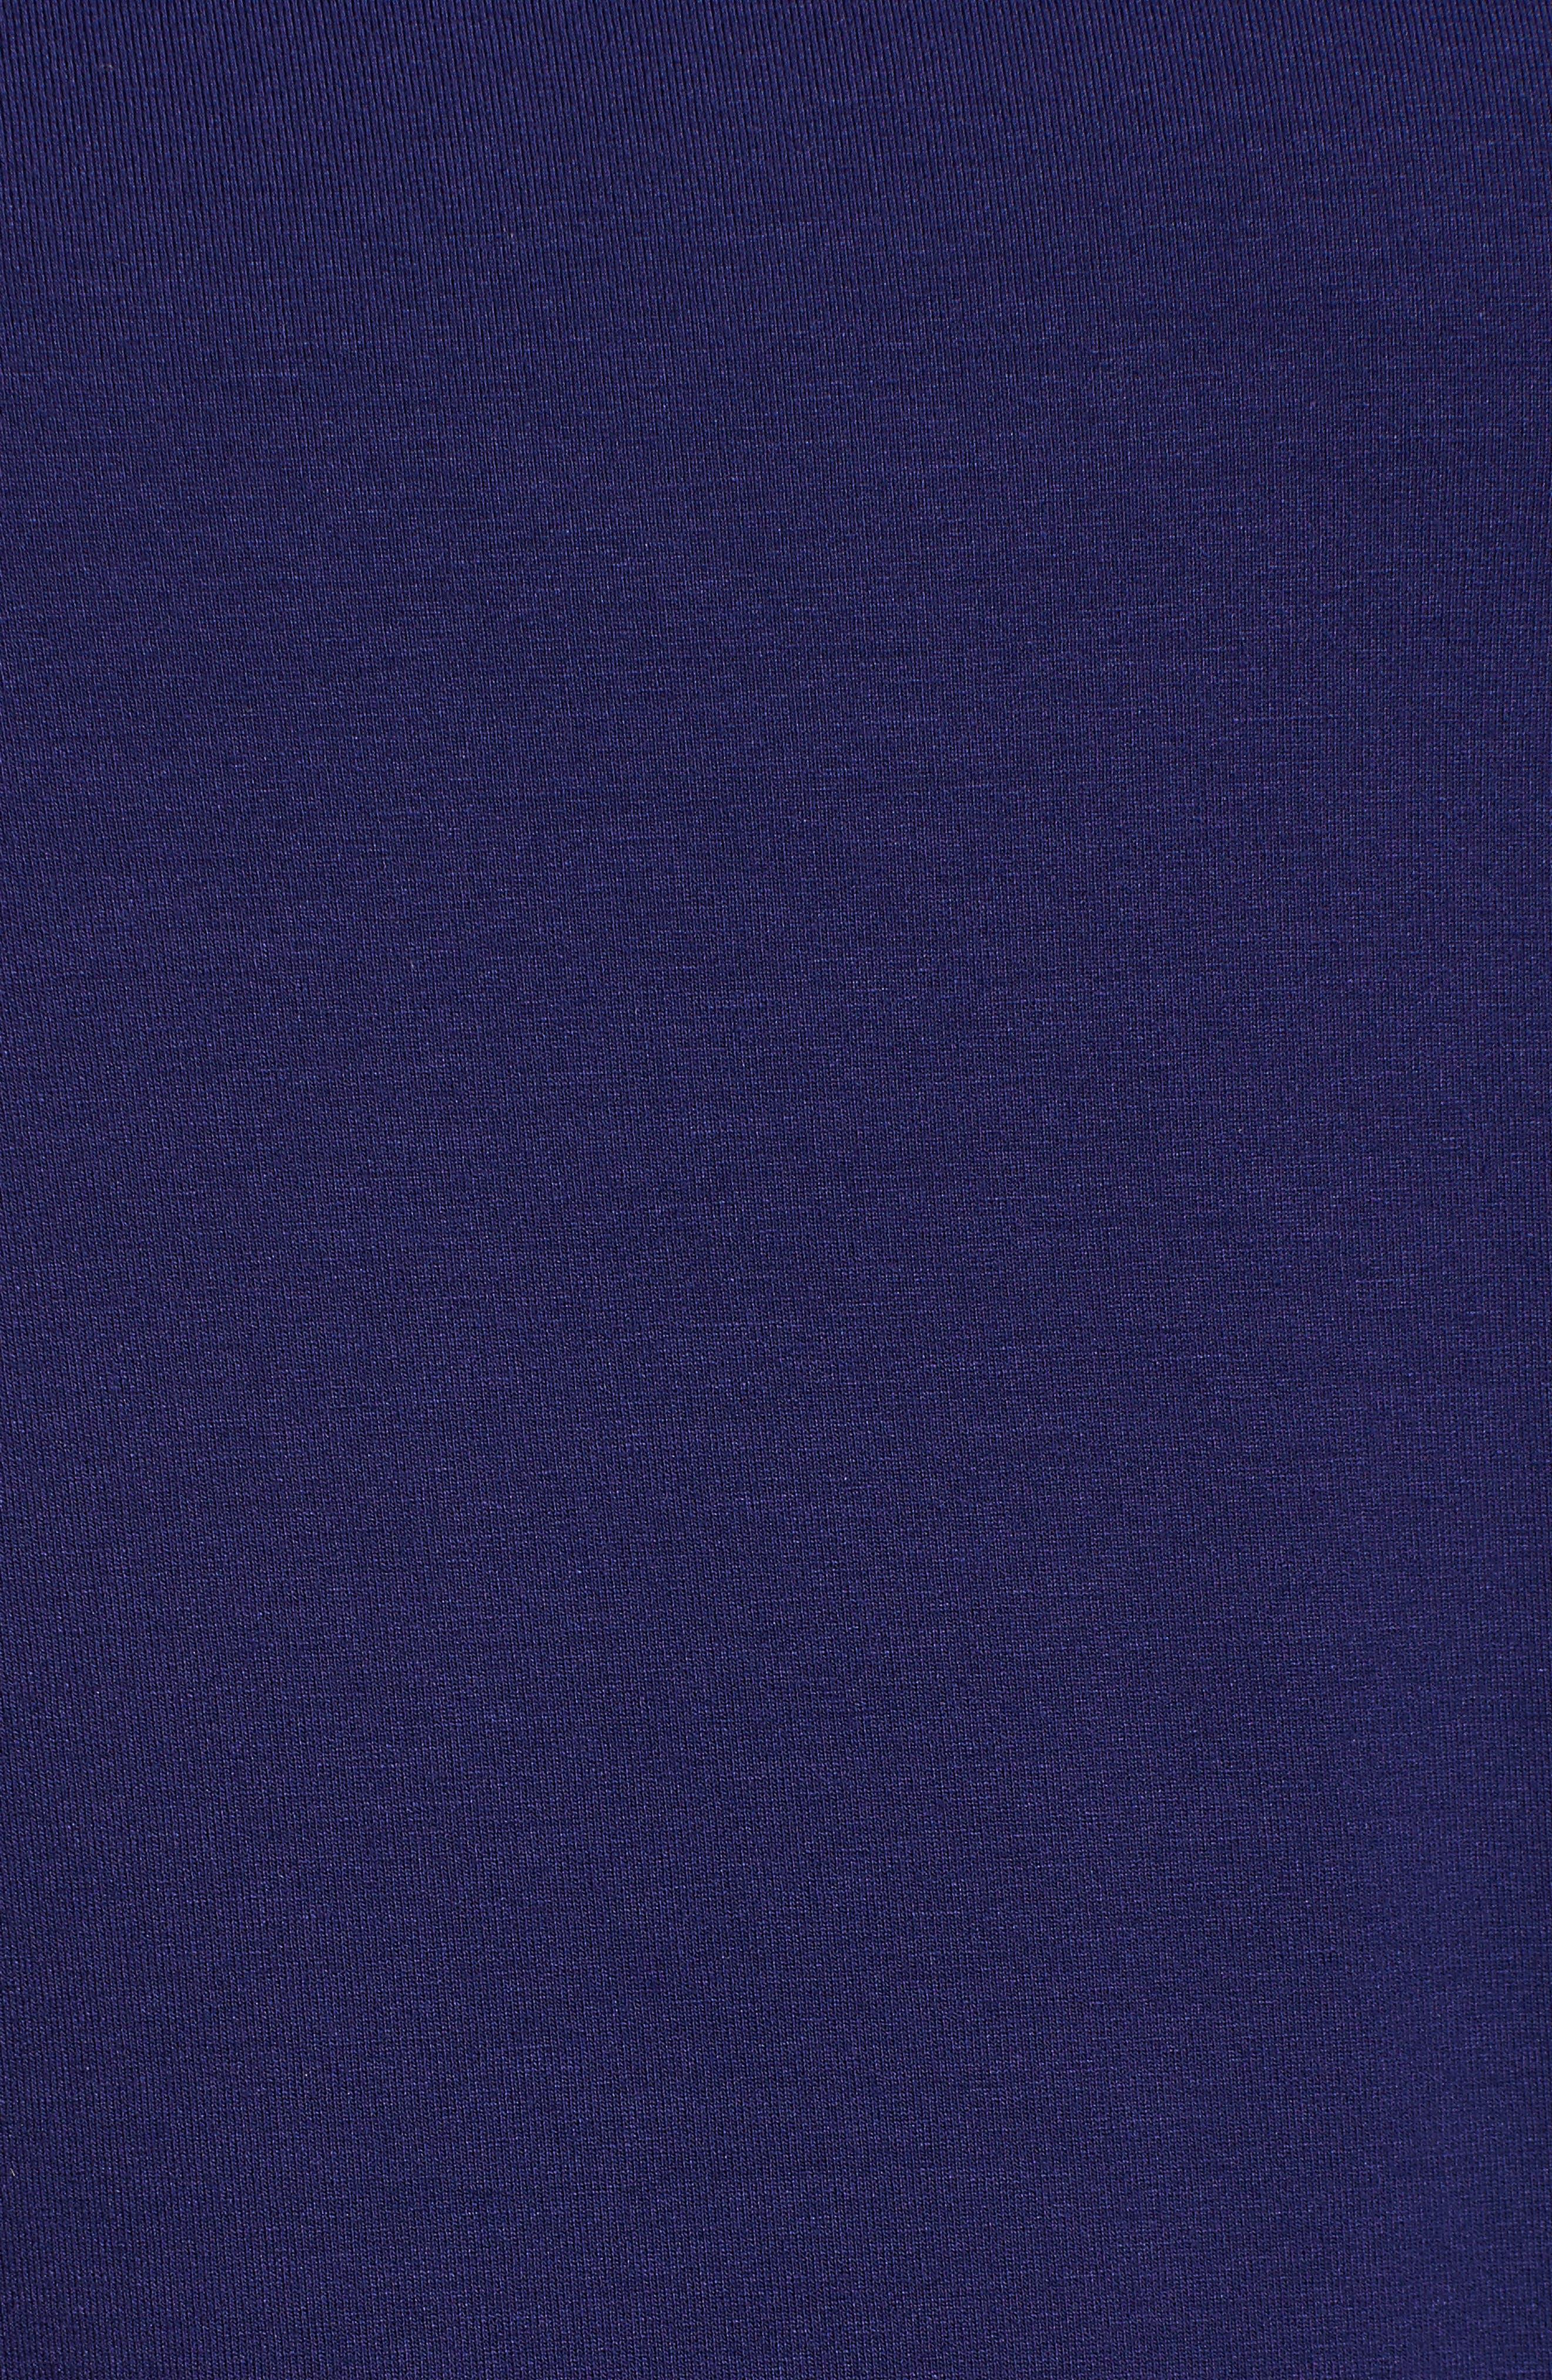 Alternate Image 5  - Eileen Fisher Bateau Neck Asymmetrical Jersey Tunic (Regular & Petite) (Online Only)